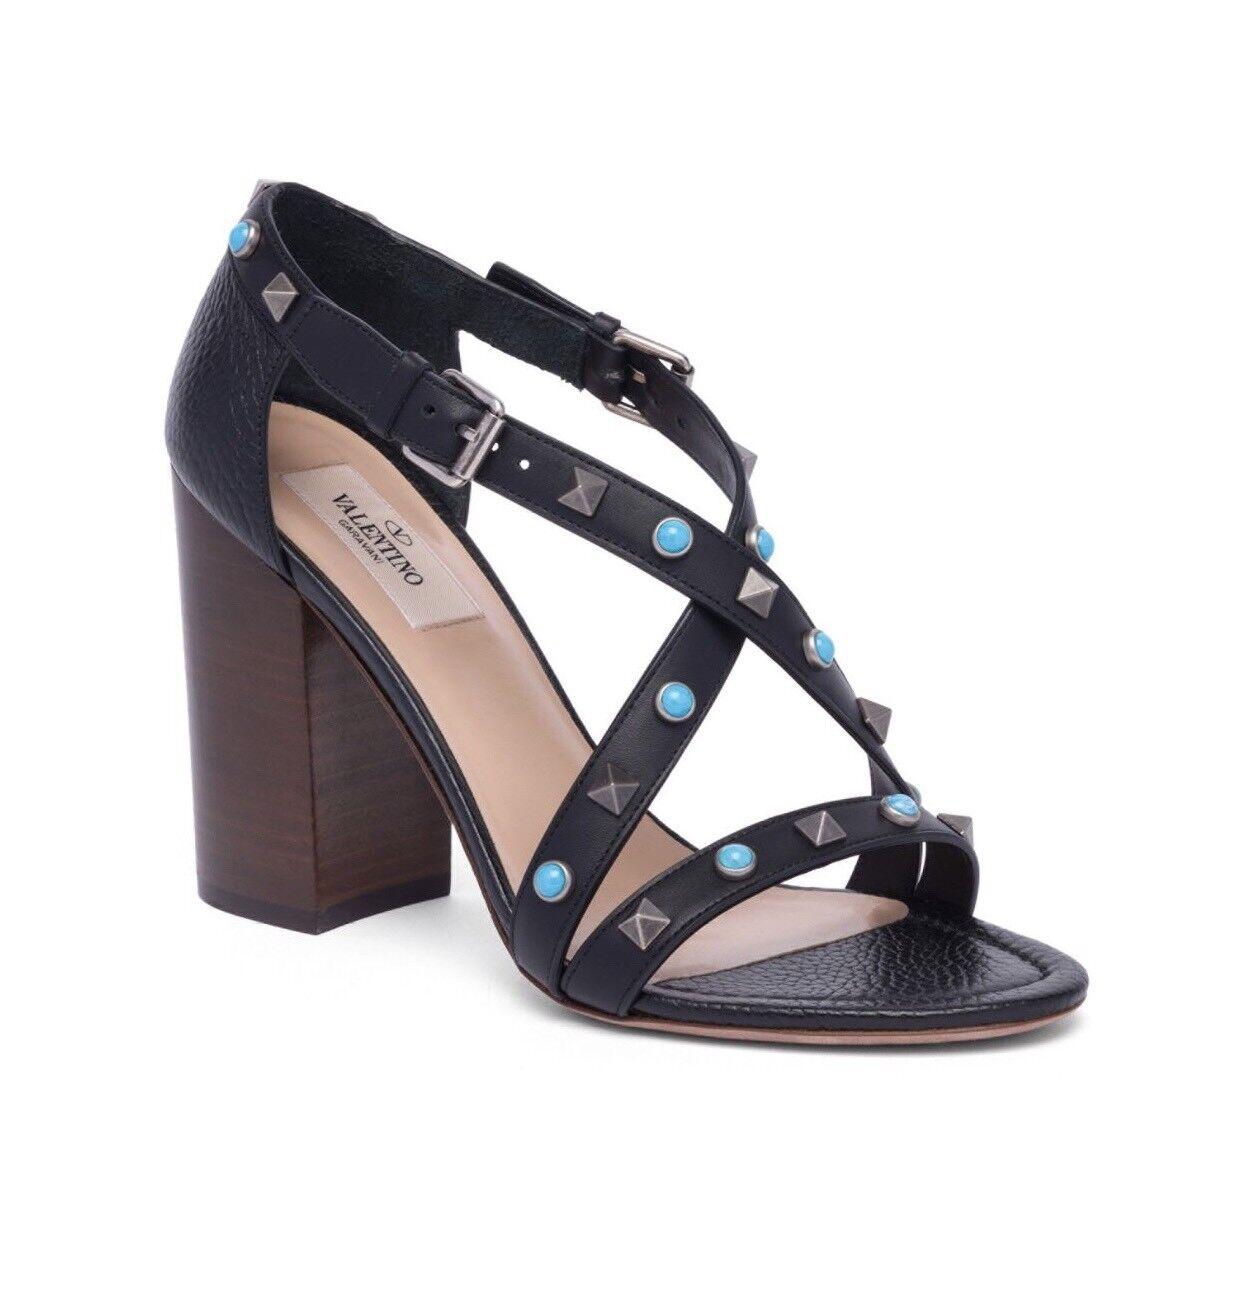 New Heel Valentino Rockstud Rolling  Leder Block Heel New Sandals Size 35EU/5US $1045.00 8c3658